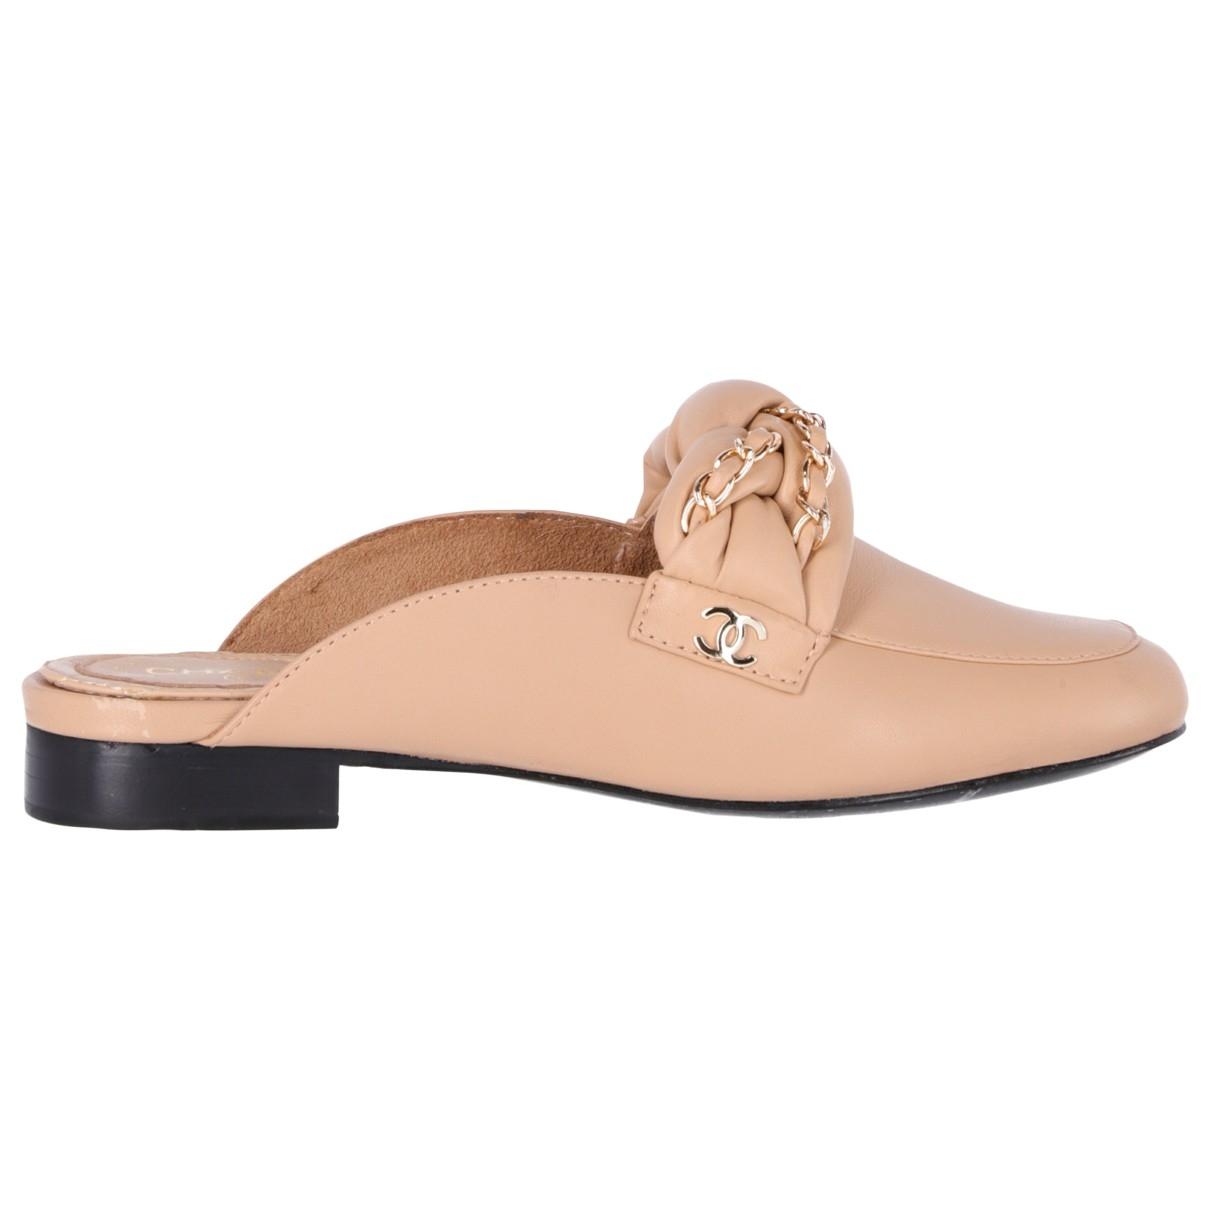 Chanel \N Beige Leather Sandals for Women 36 EU